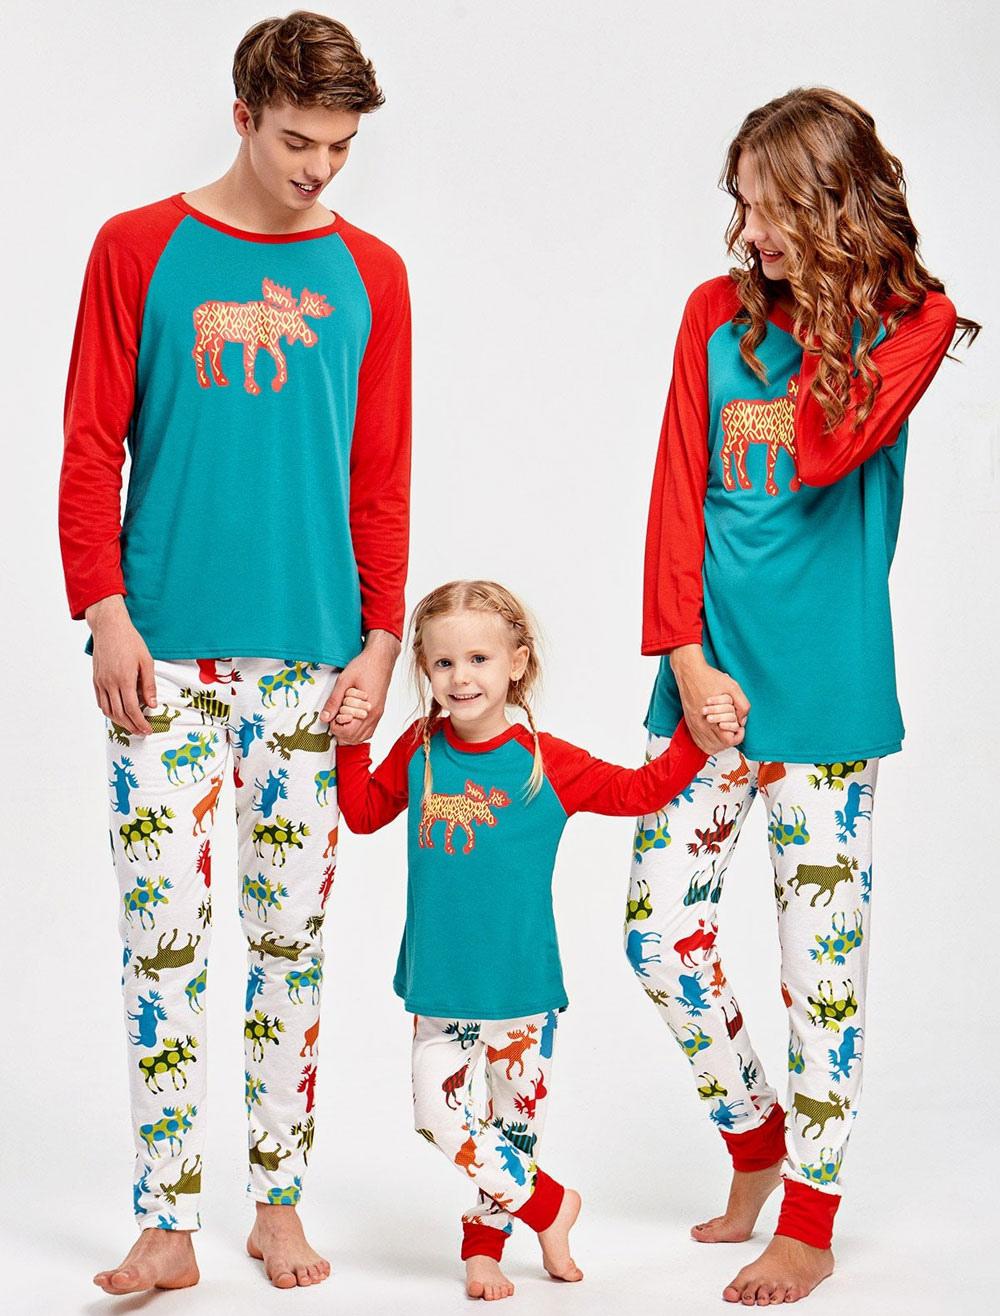 Christmas Family Pajamas Set.Christmas Family Pajamas Mother Blue Printed Top And Pants 2 Piece Set For Women